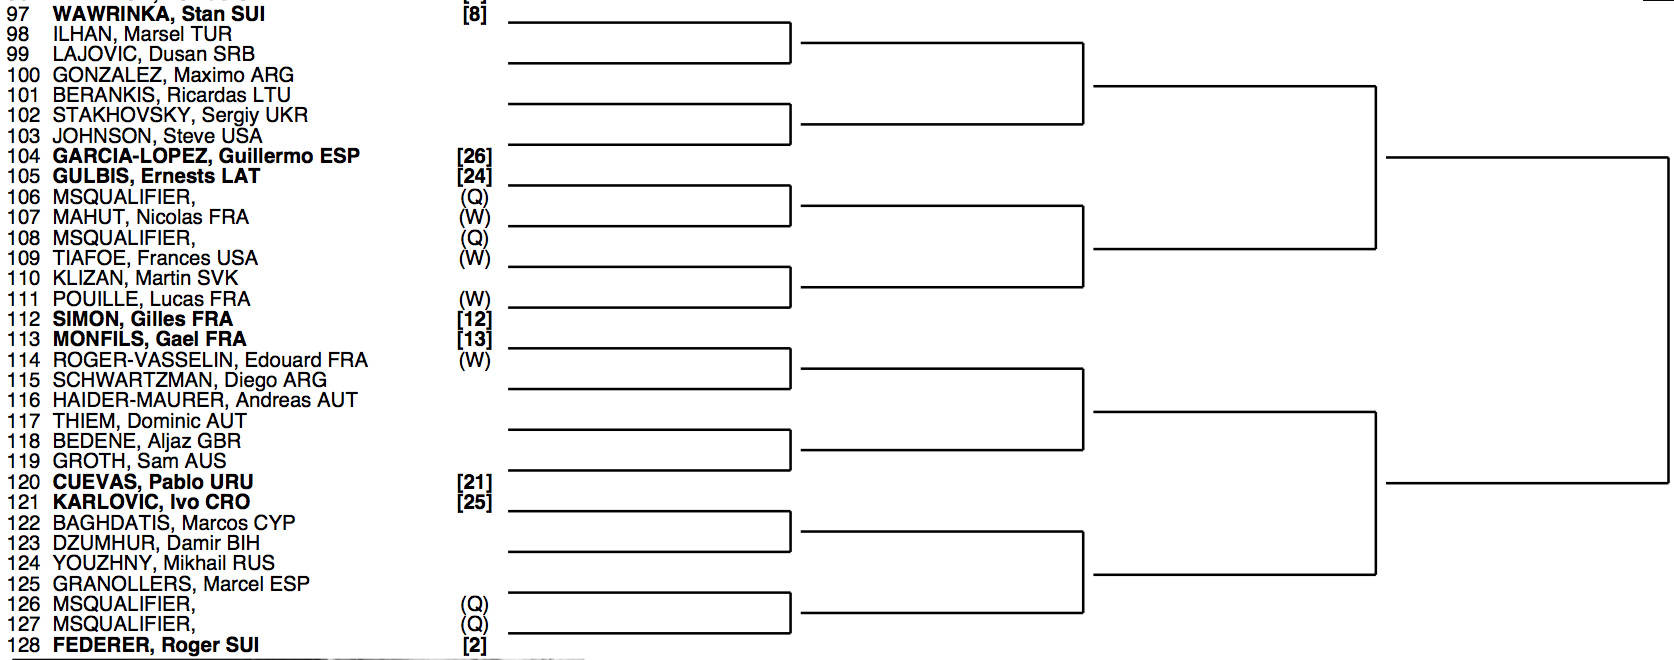 Roland Garros 2015 Draw 4:4